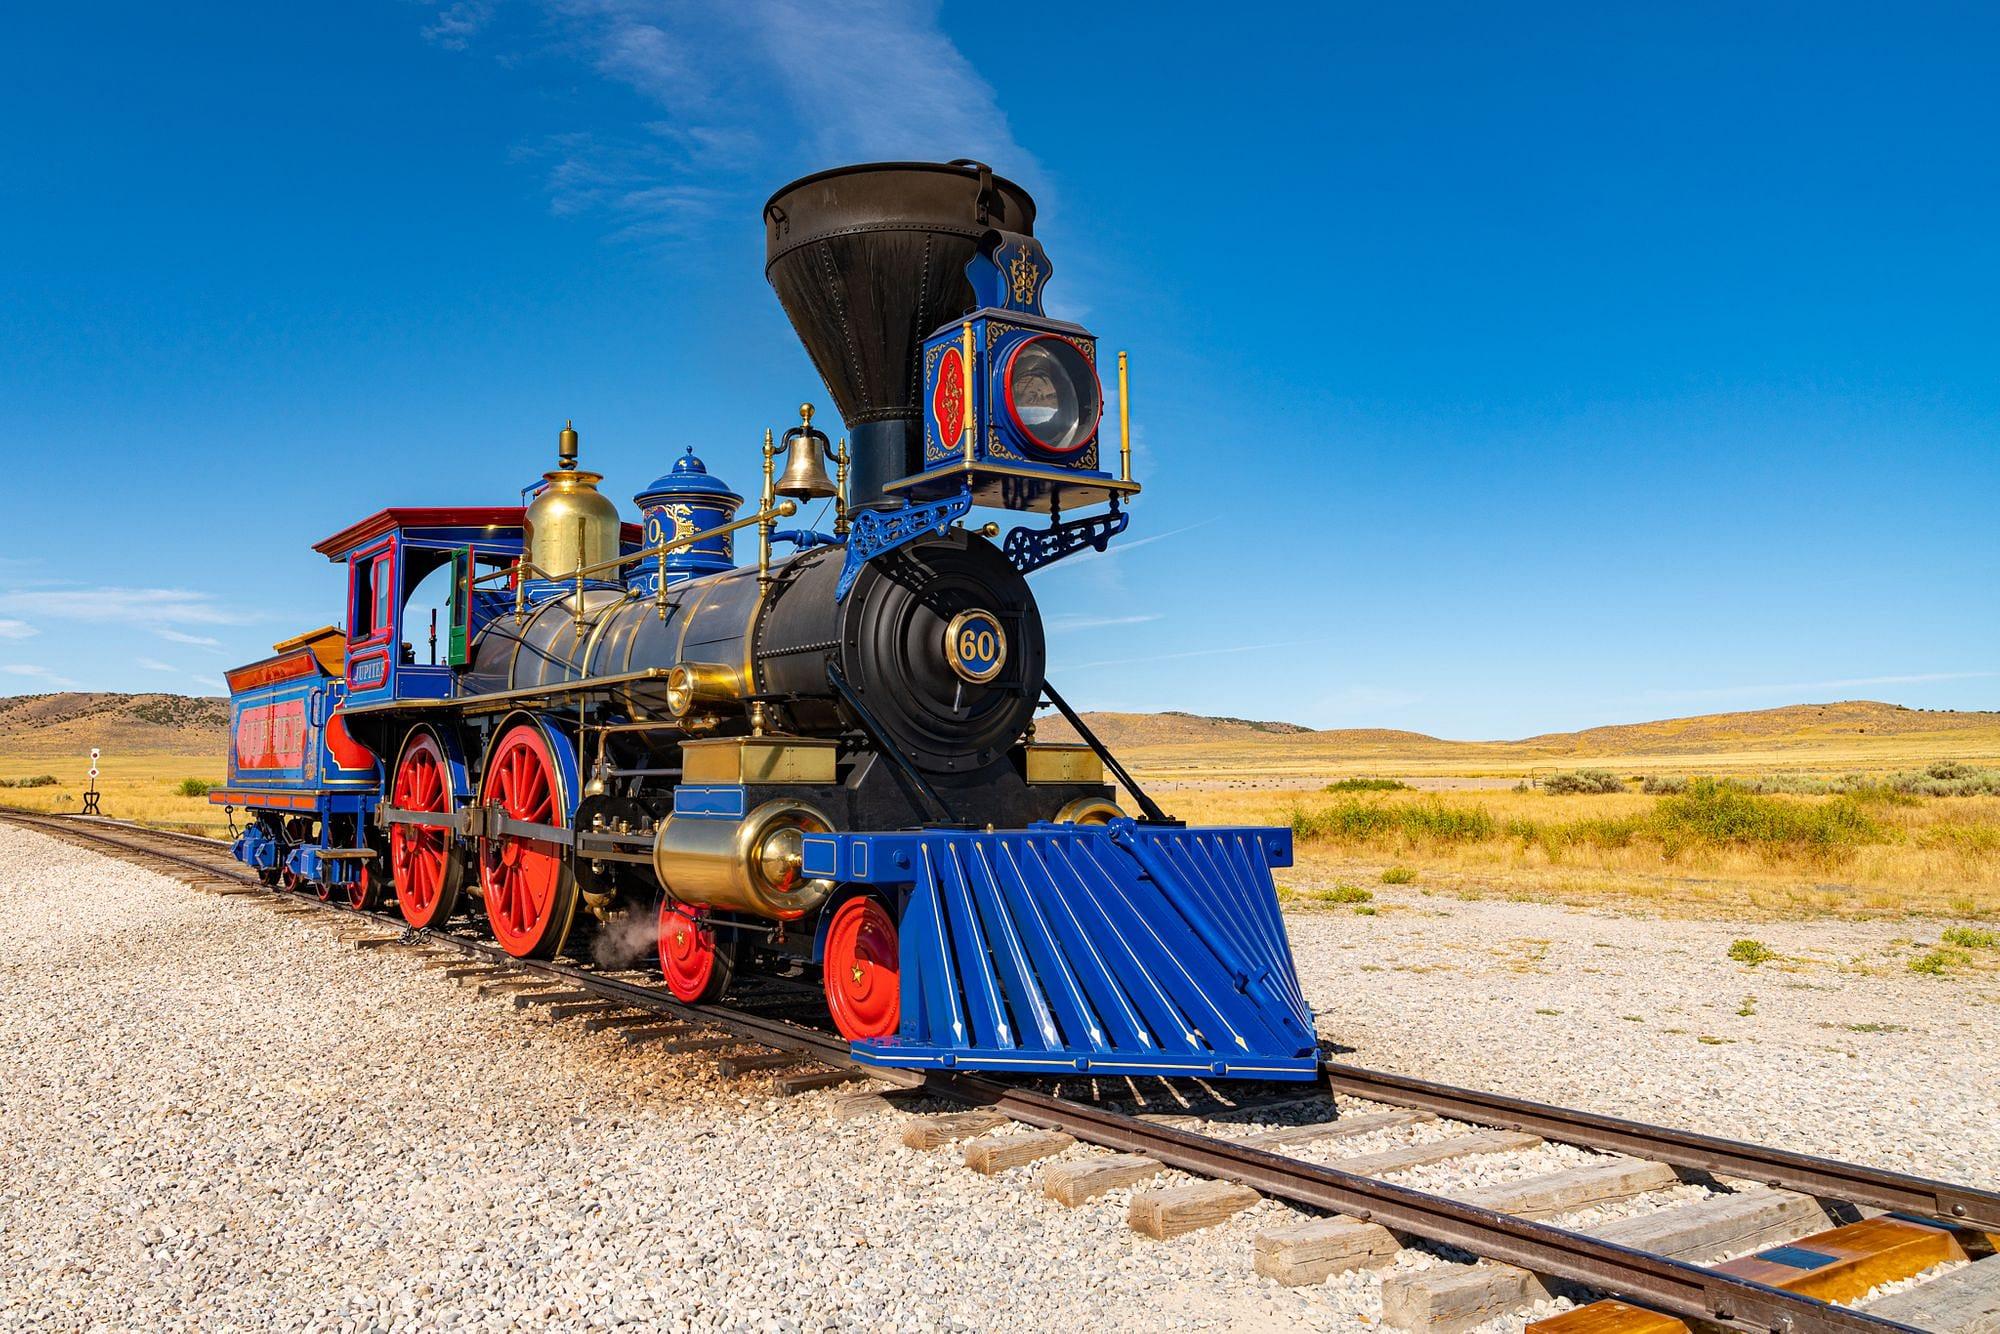 Jupiter Locomotive